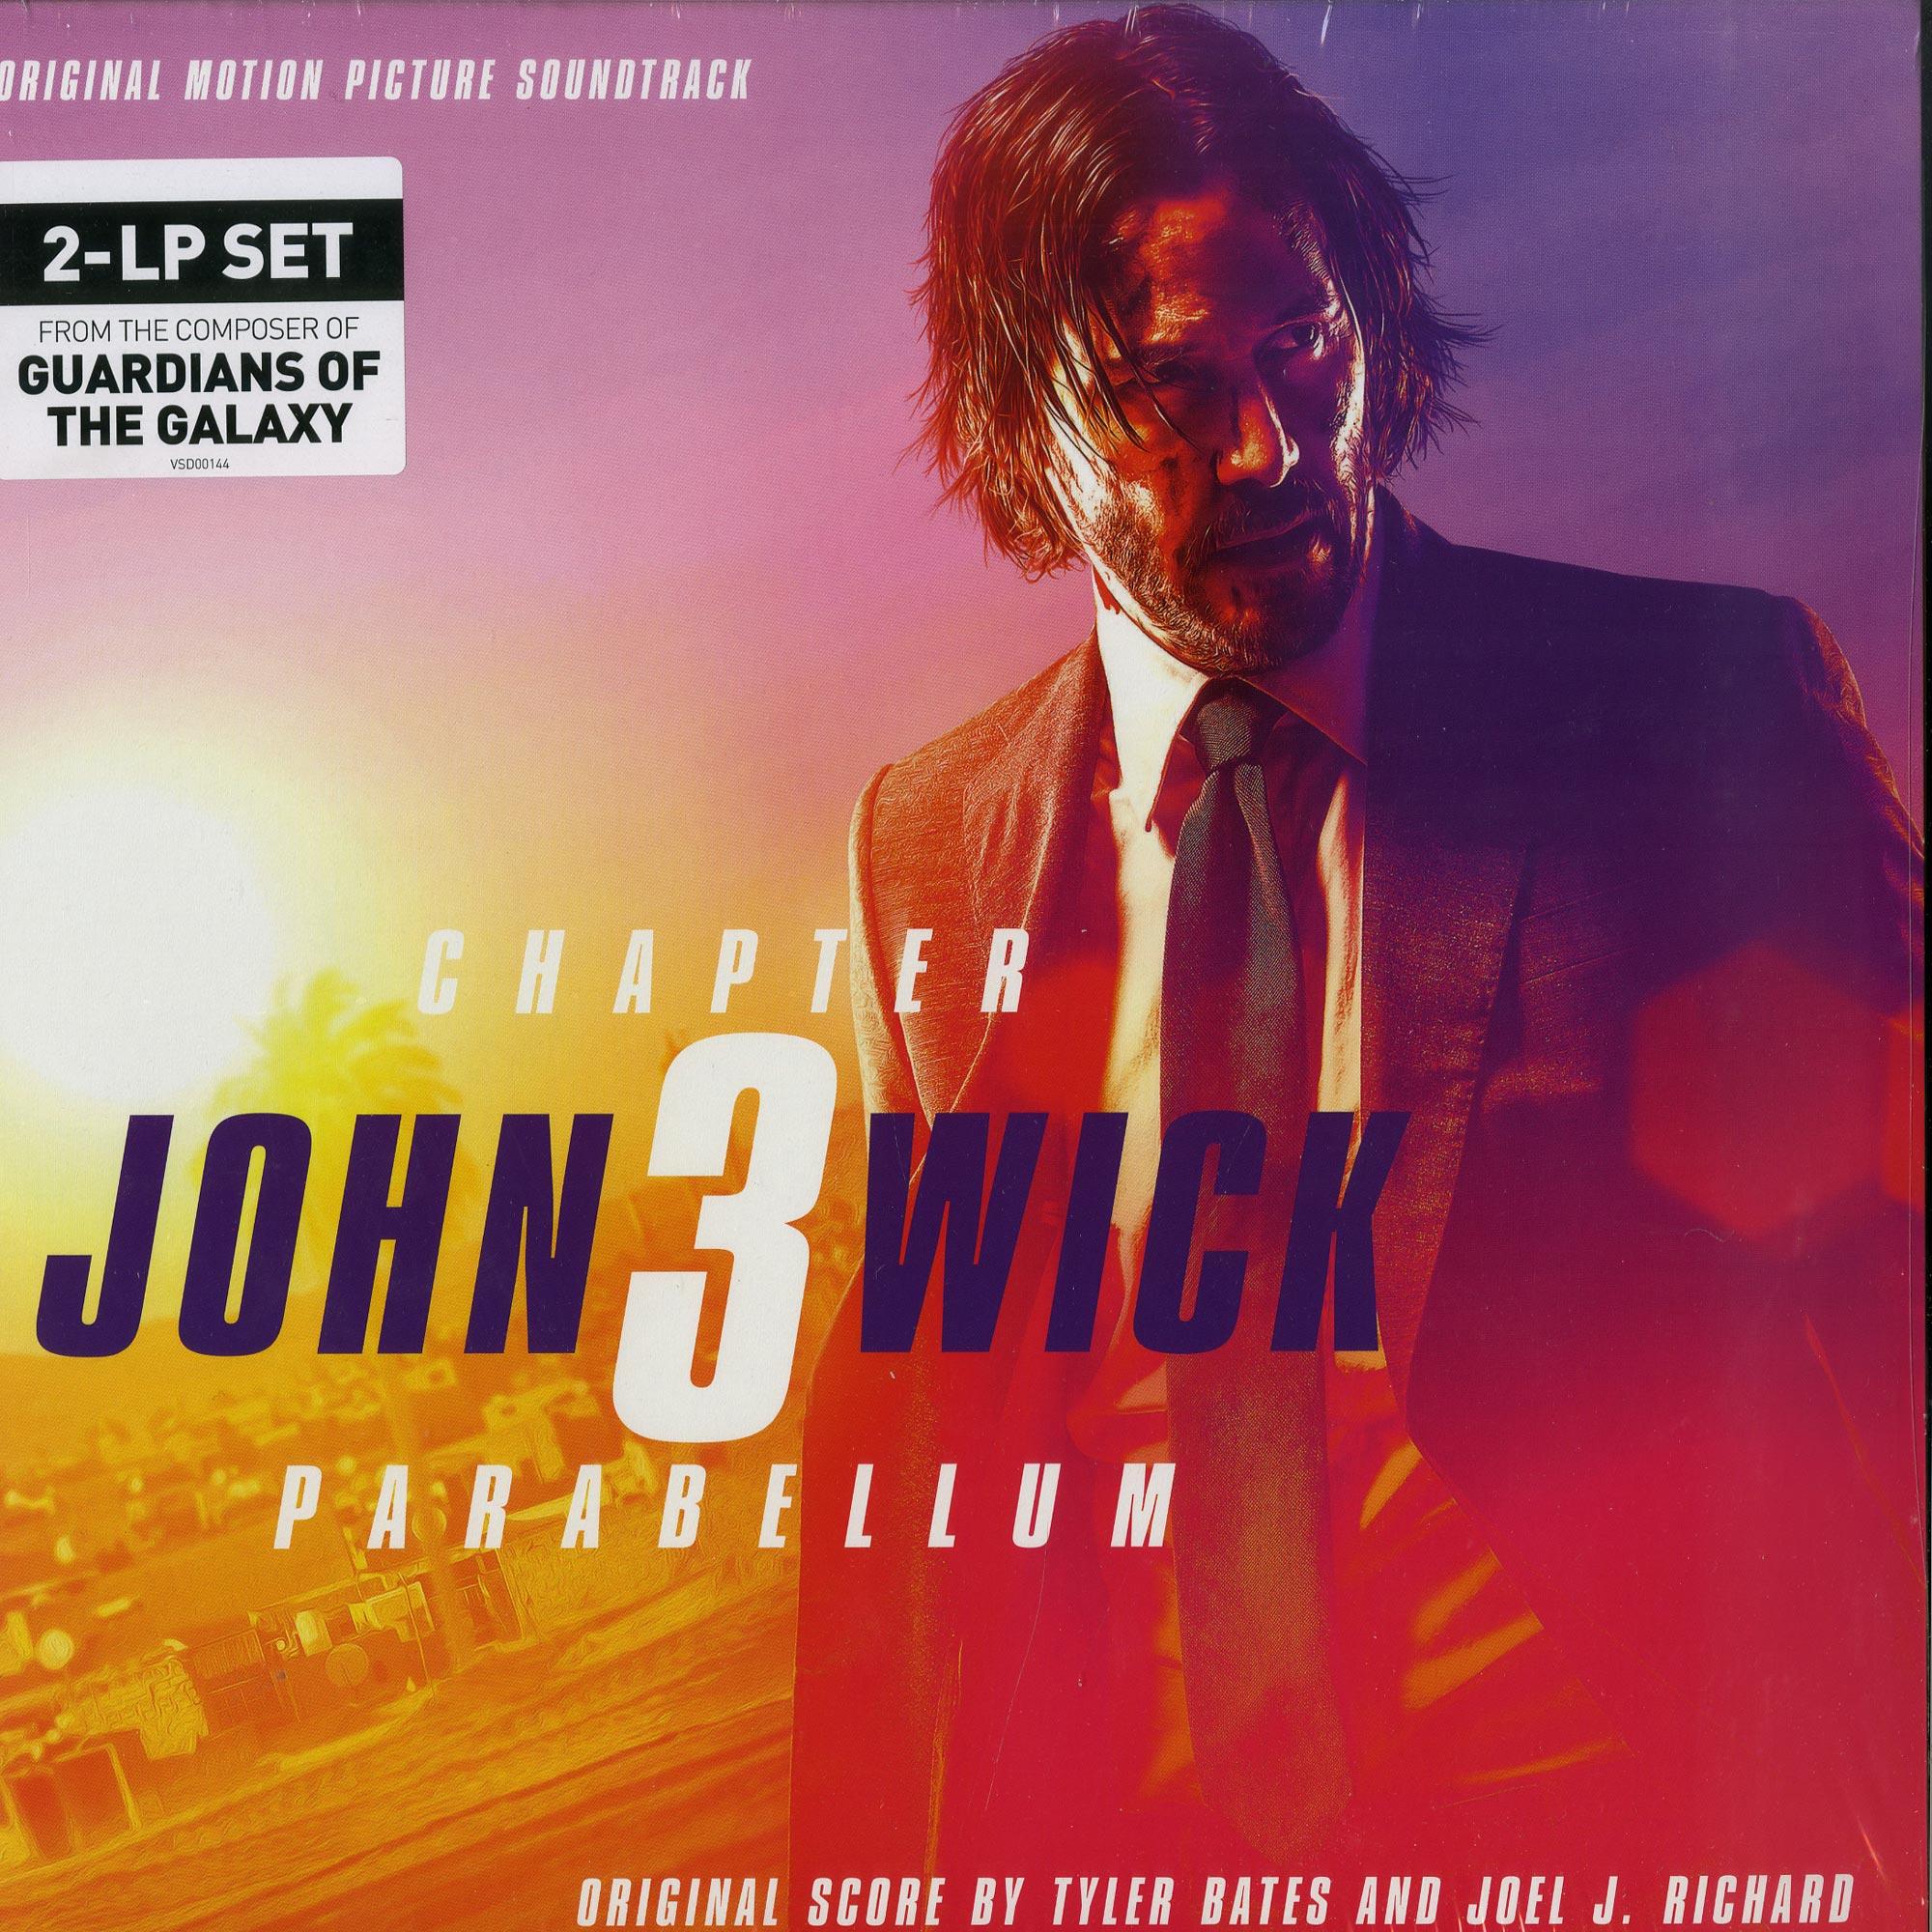 Tyler Bates & Joel J. Richard - JOHN WICK: CHAPTER 3 - PARABELLUM O.S.T.